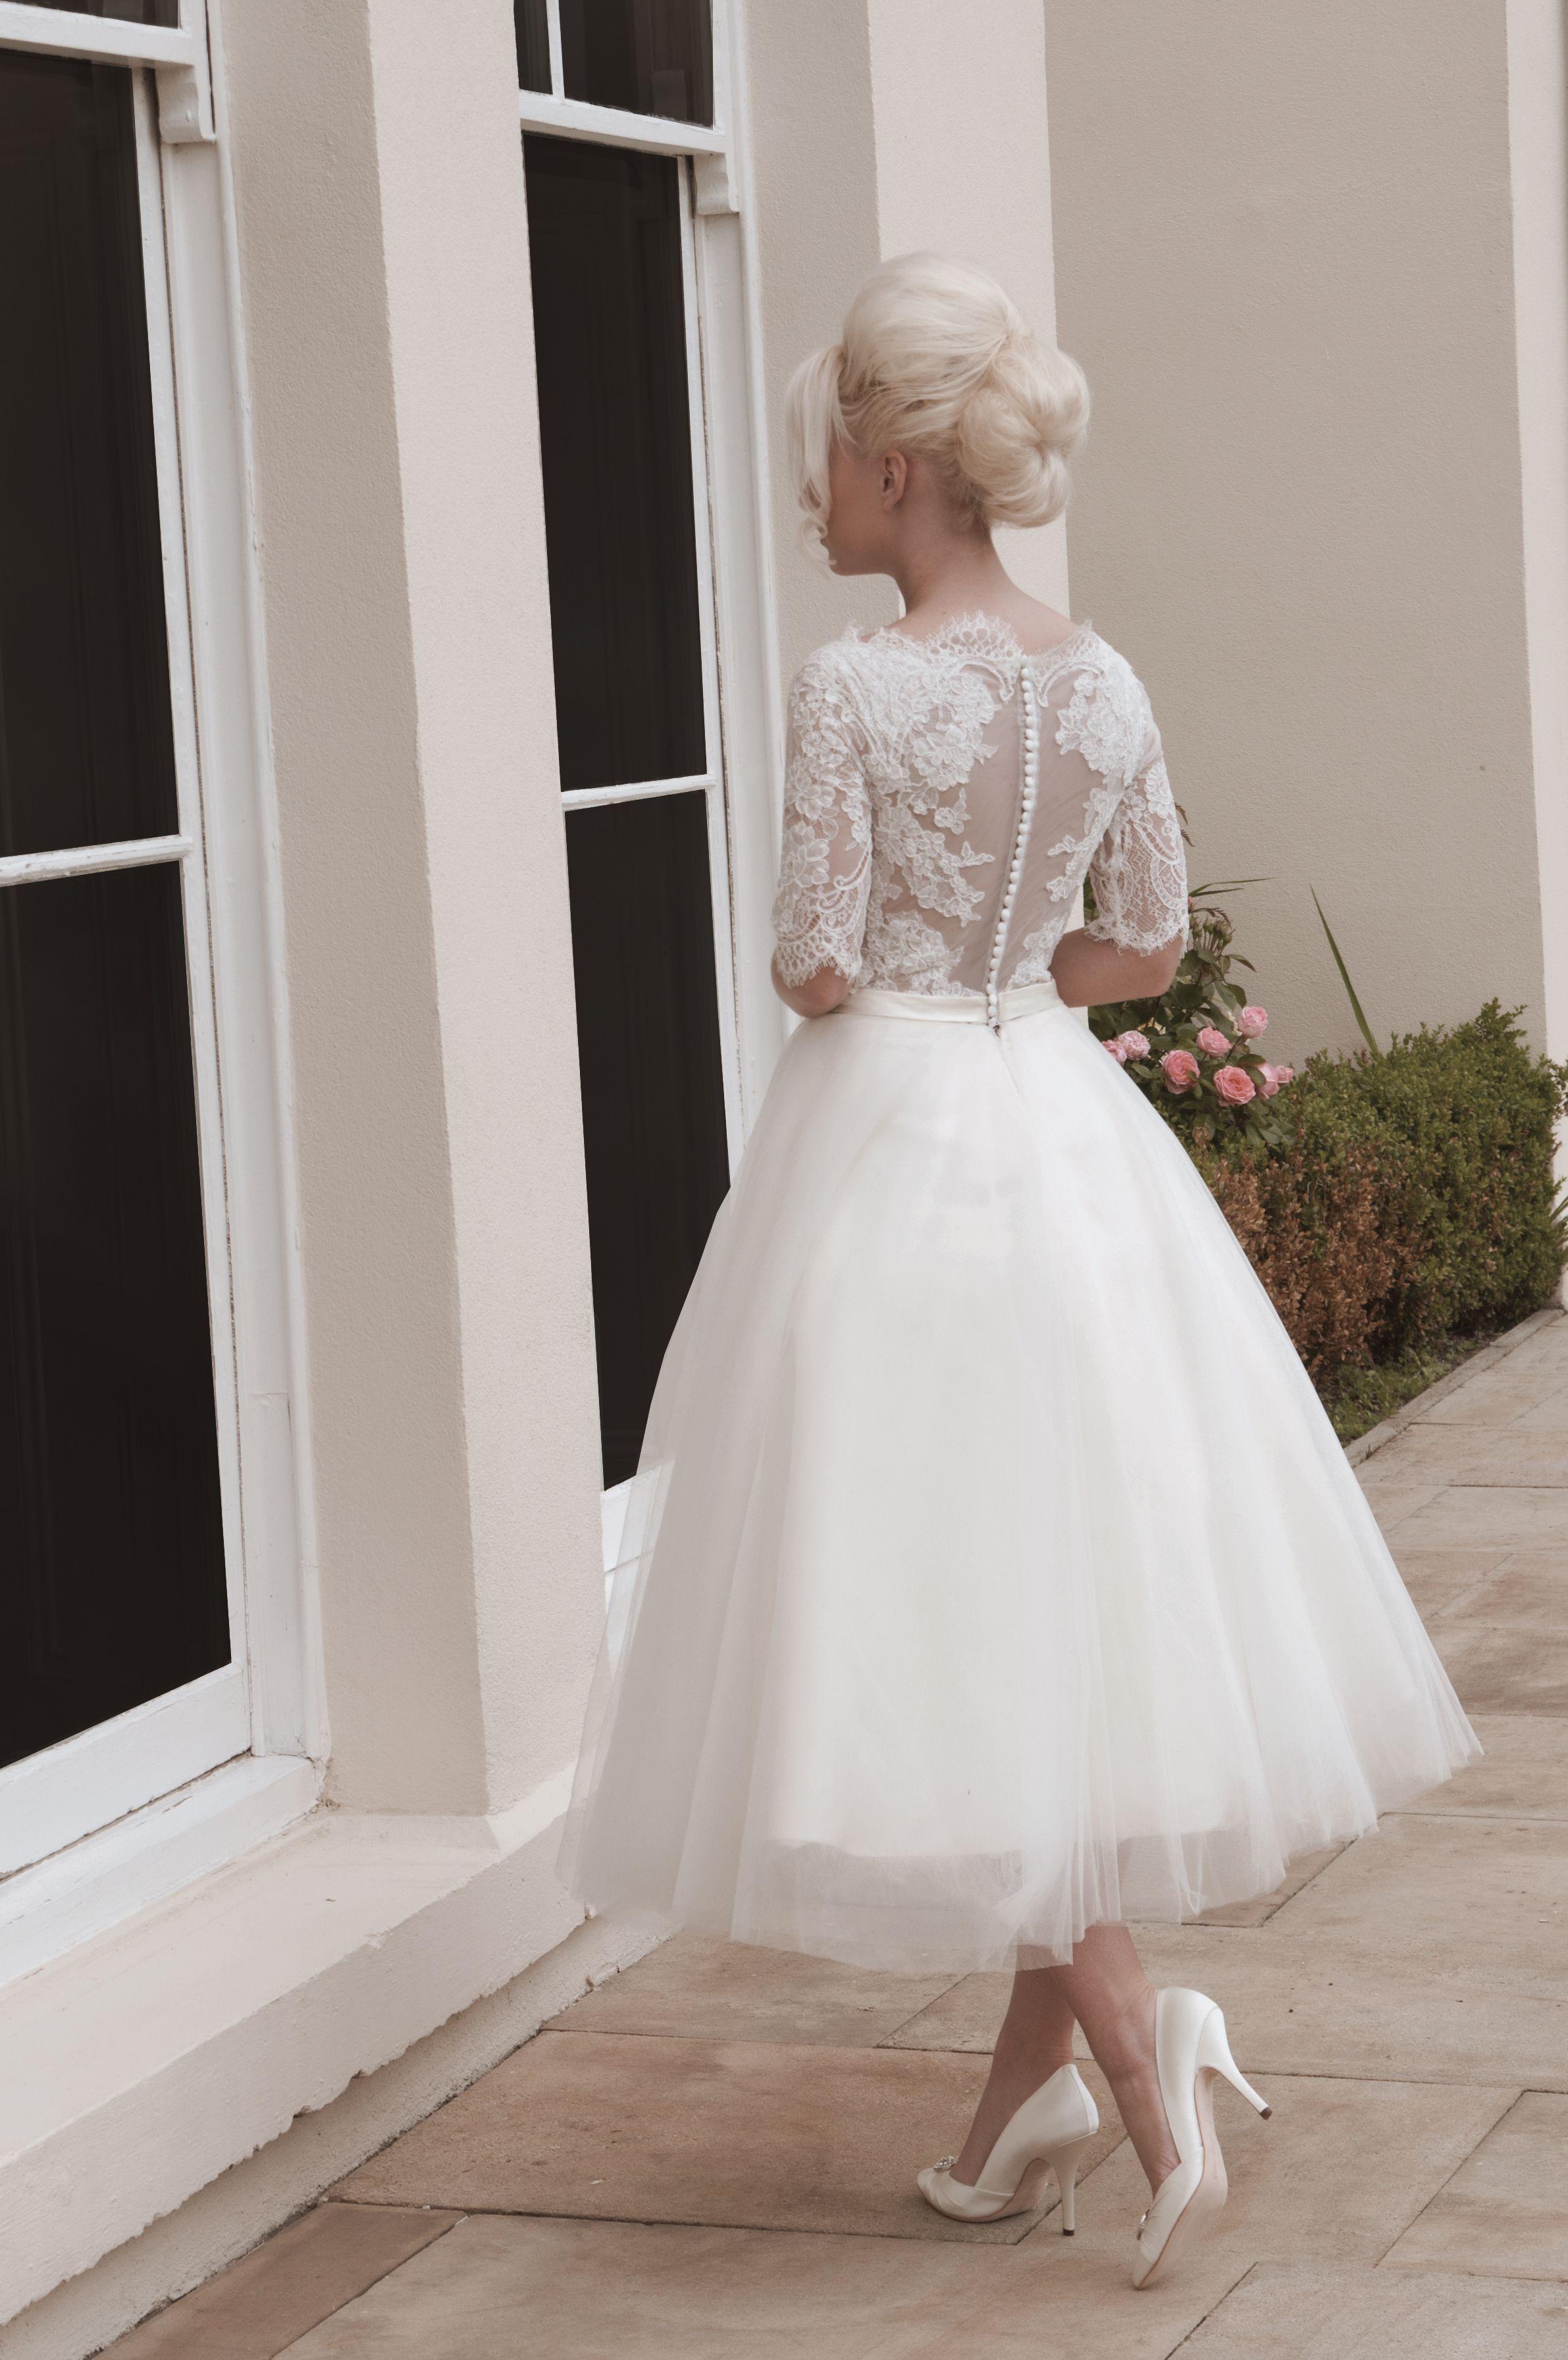 Darla Beautiful Soft And Feminine Tulle And Lace Short Calf Length Wedding Dress Darla Has Subtle De Short Wedding Dress Tulle Wedding Dress Wedding Dresses [ 3585 x 2382 Pixel ]